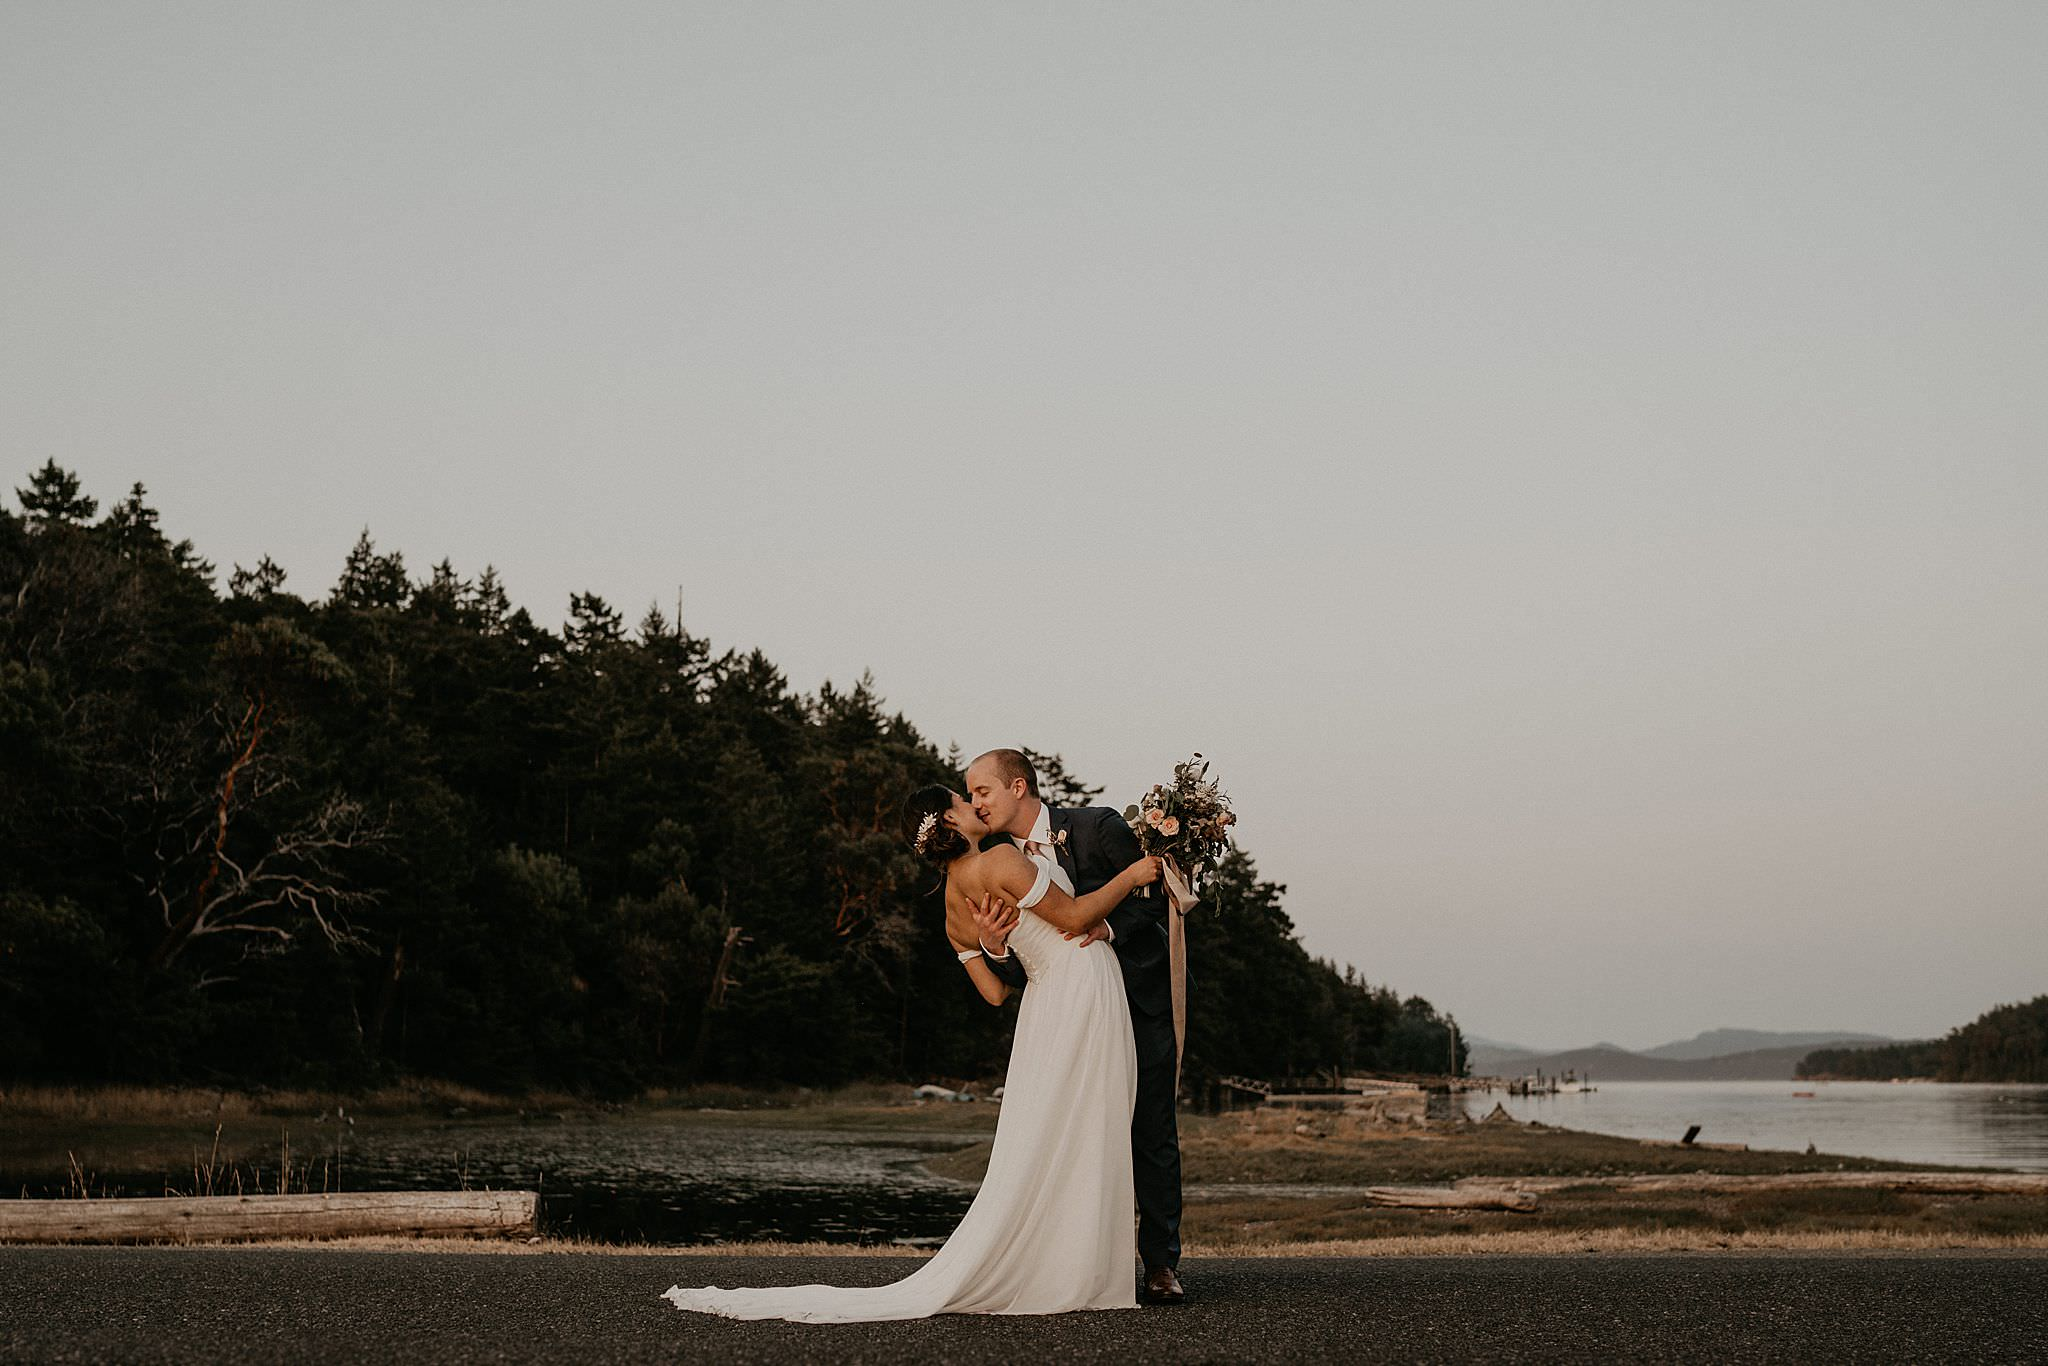 roche-harbor-wedding-san-juans-island-washington_0177.jpg